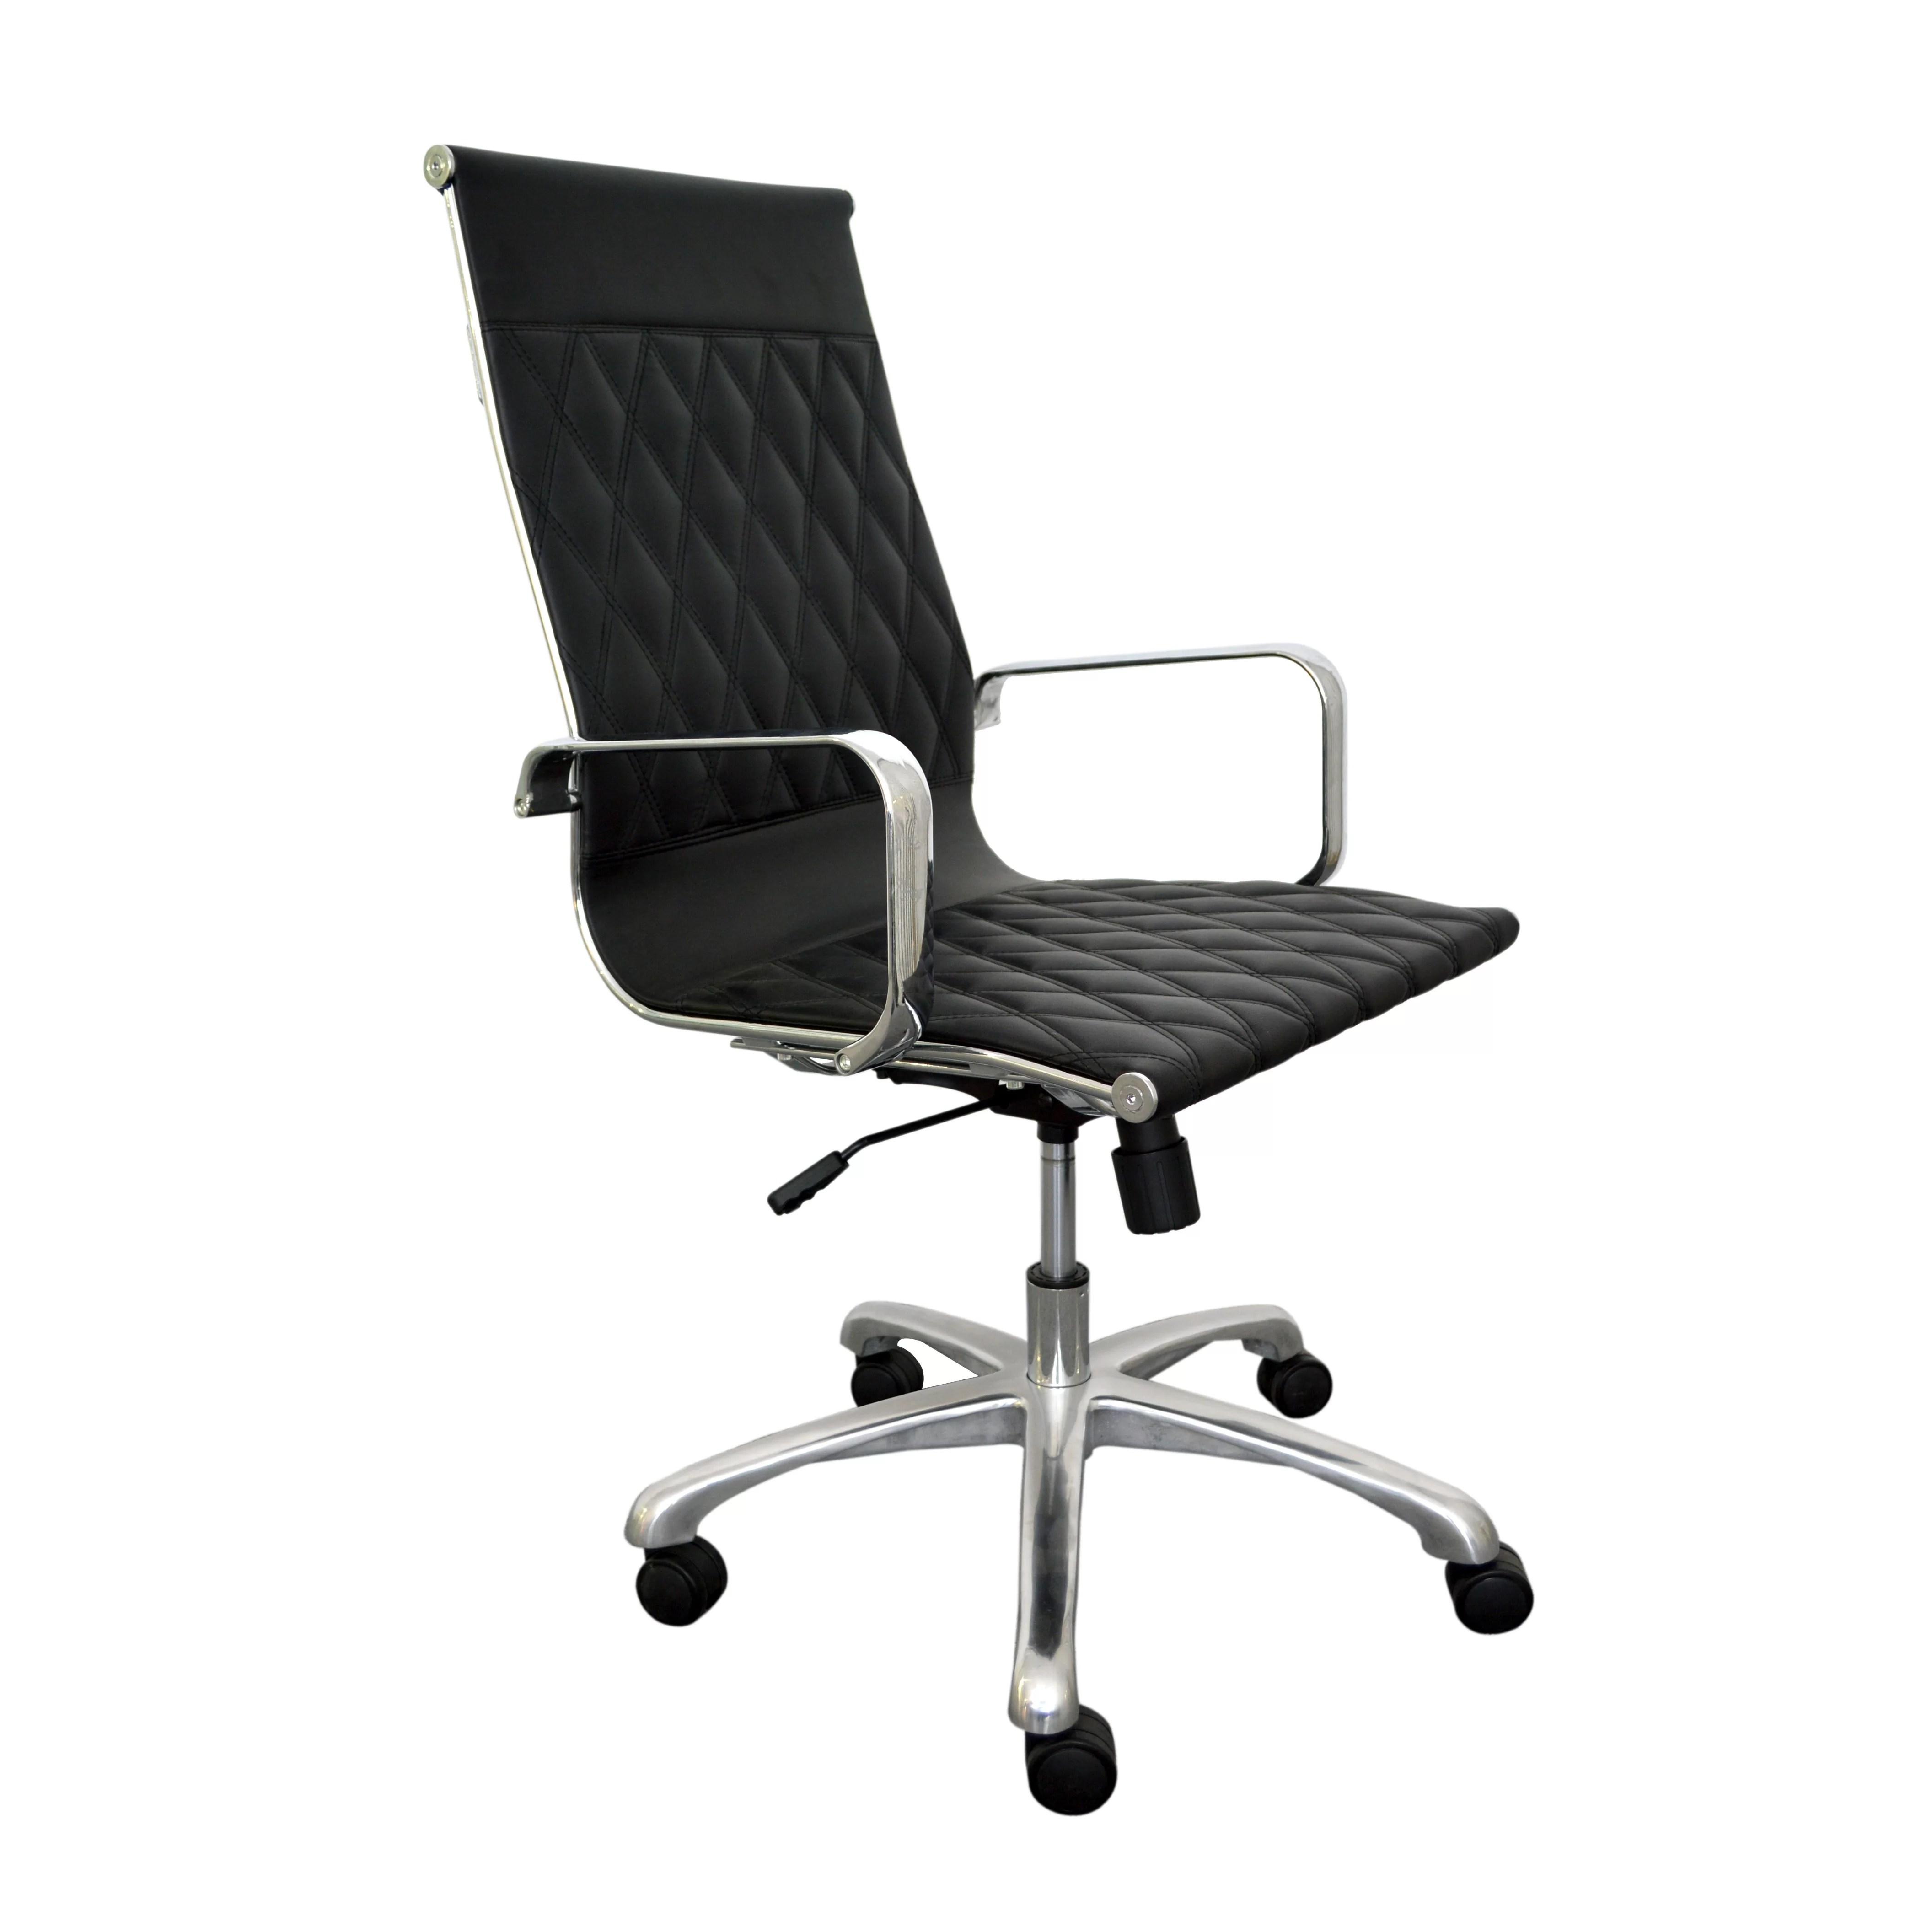 desk chair reviews big joe bean bag lots woodstock marketing annie and wayfair